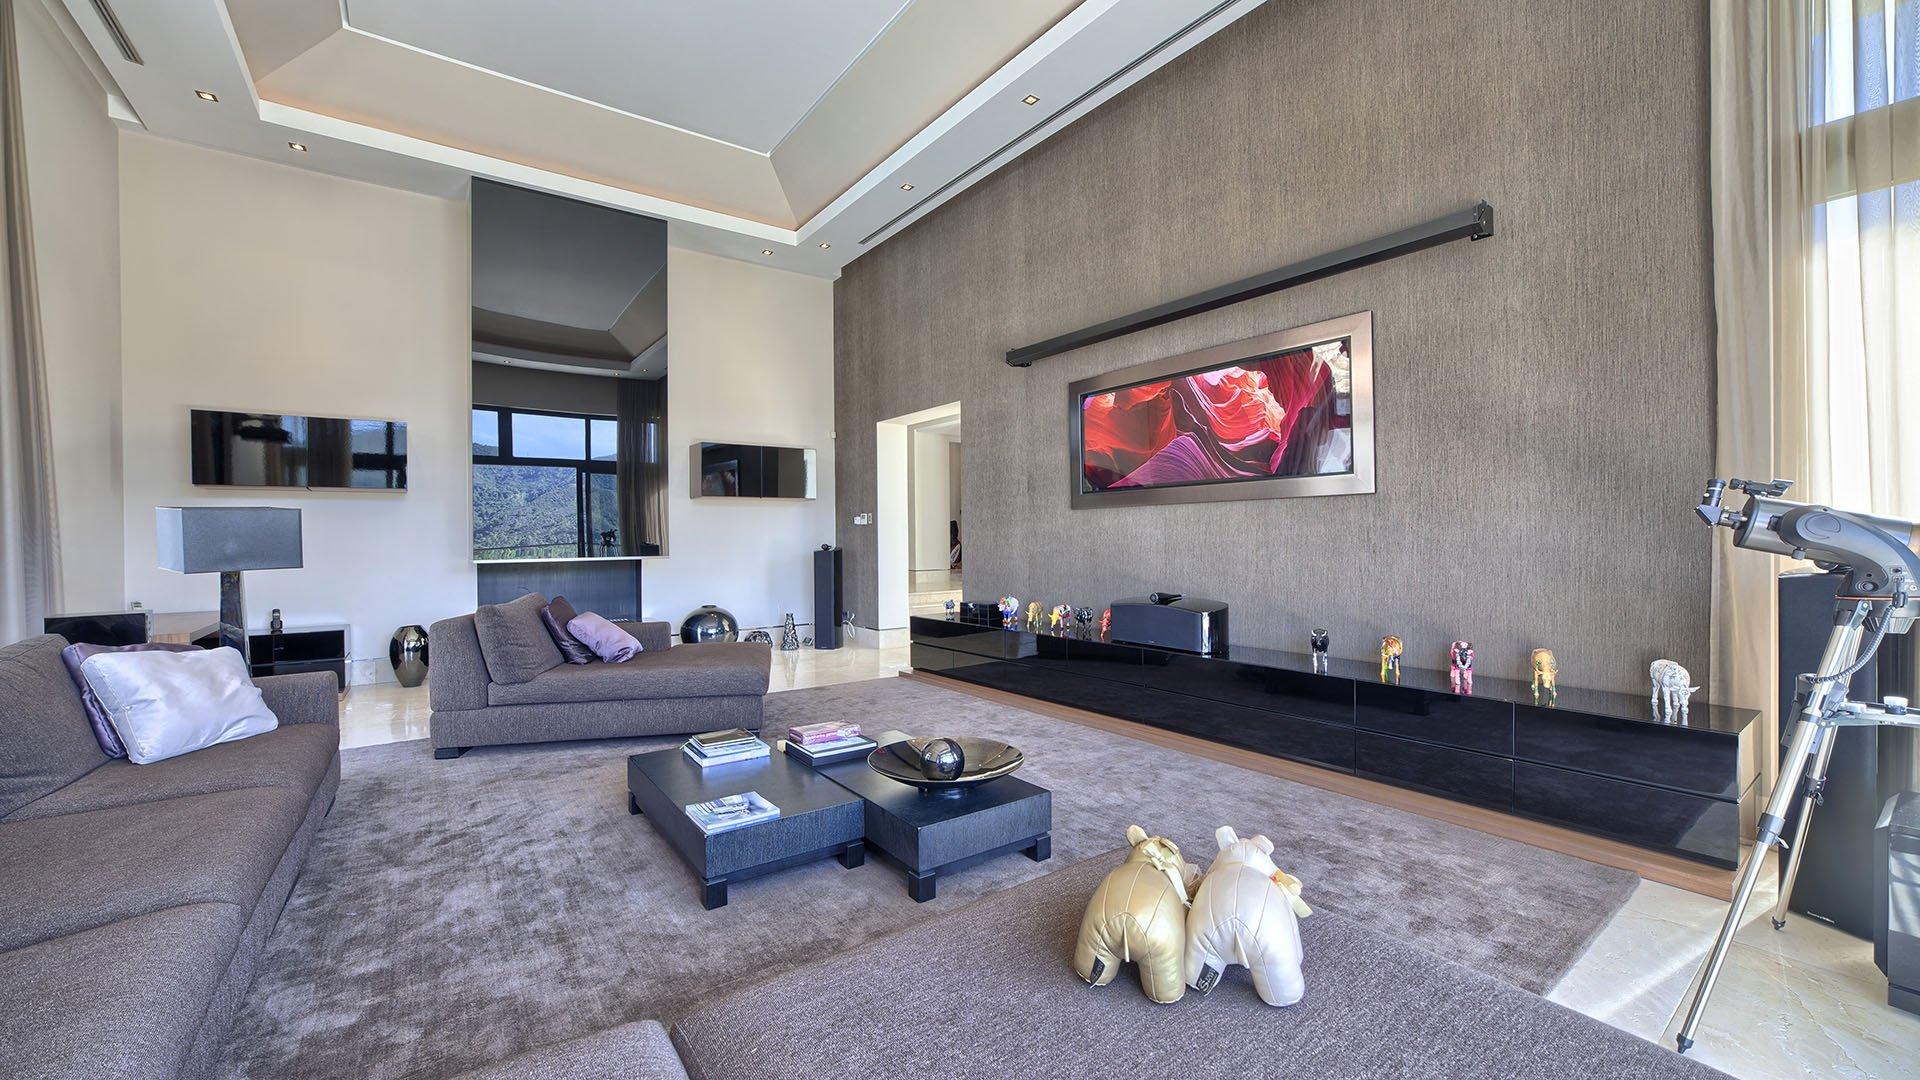 Villa La Zagaleta F1-30: Sensationele villa met onovertroffen landelijke uitzicht